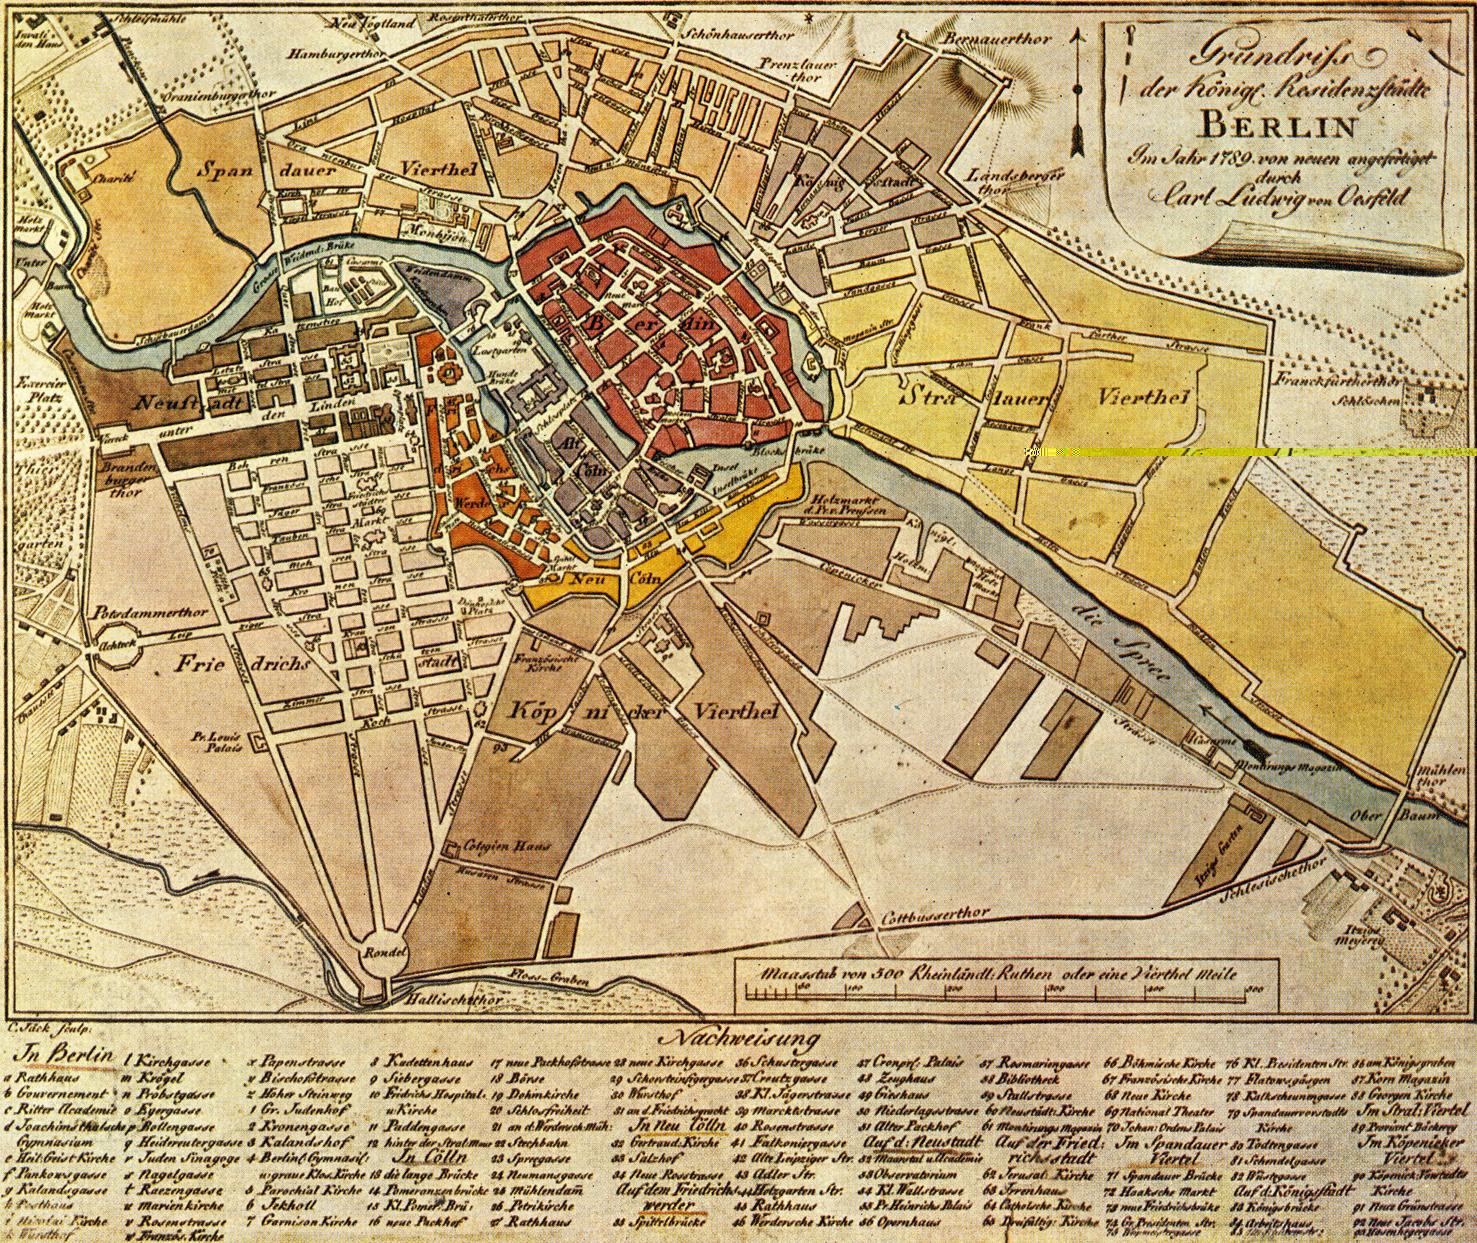 Berlin map 1789